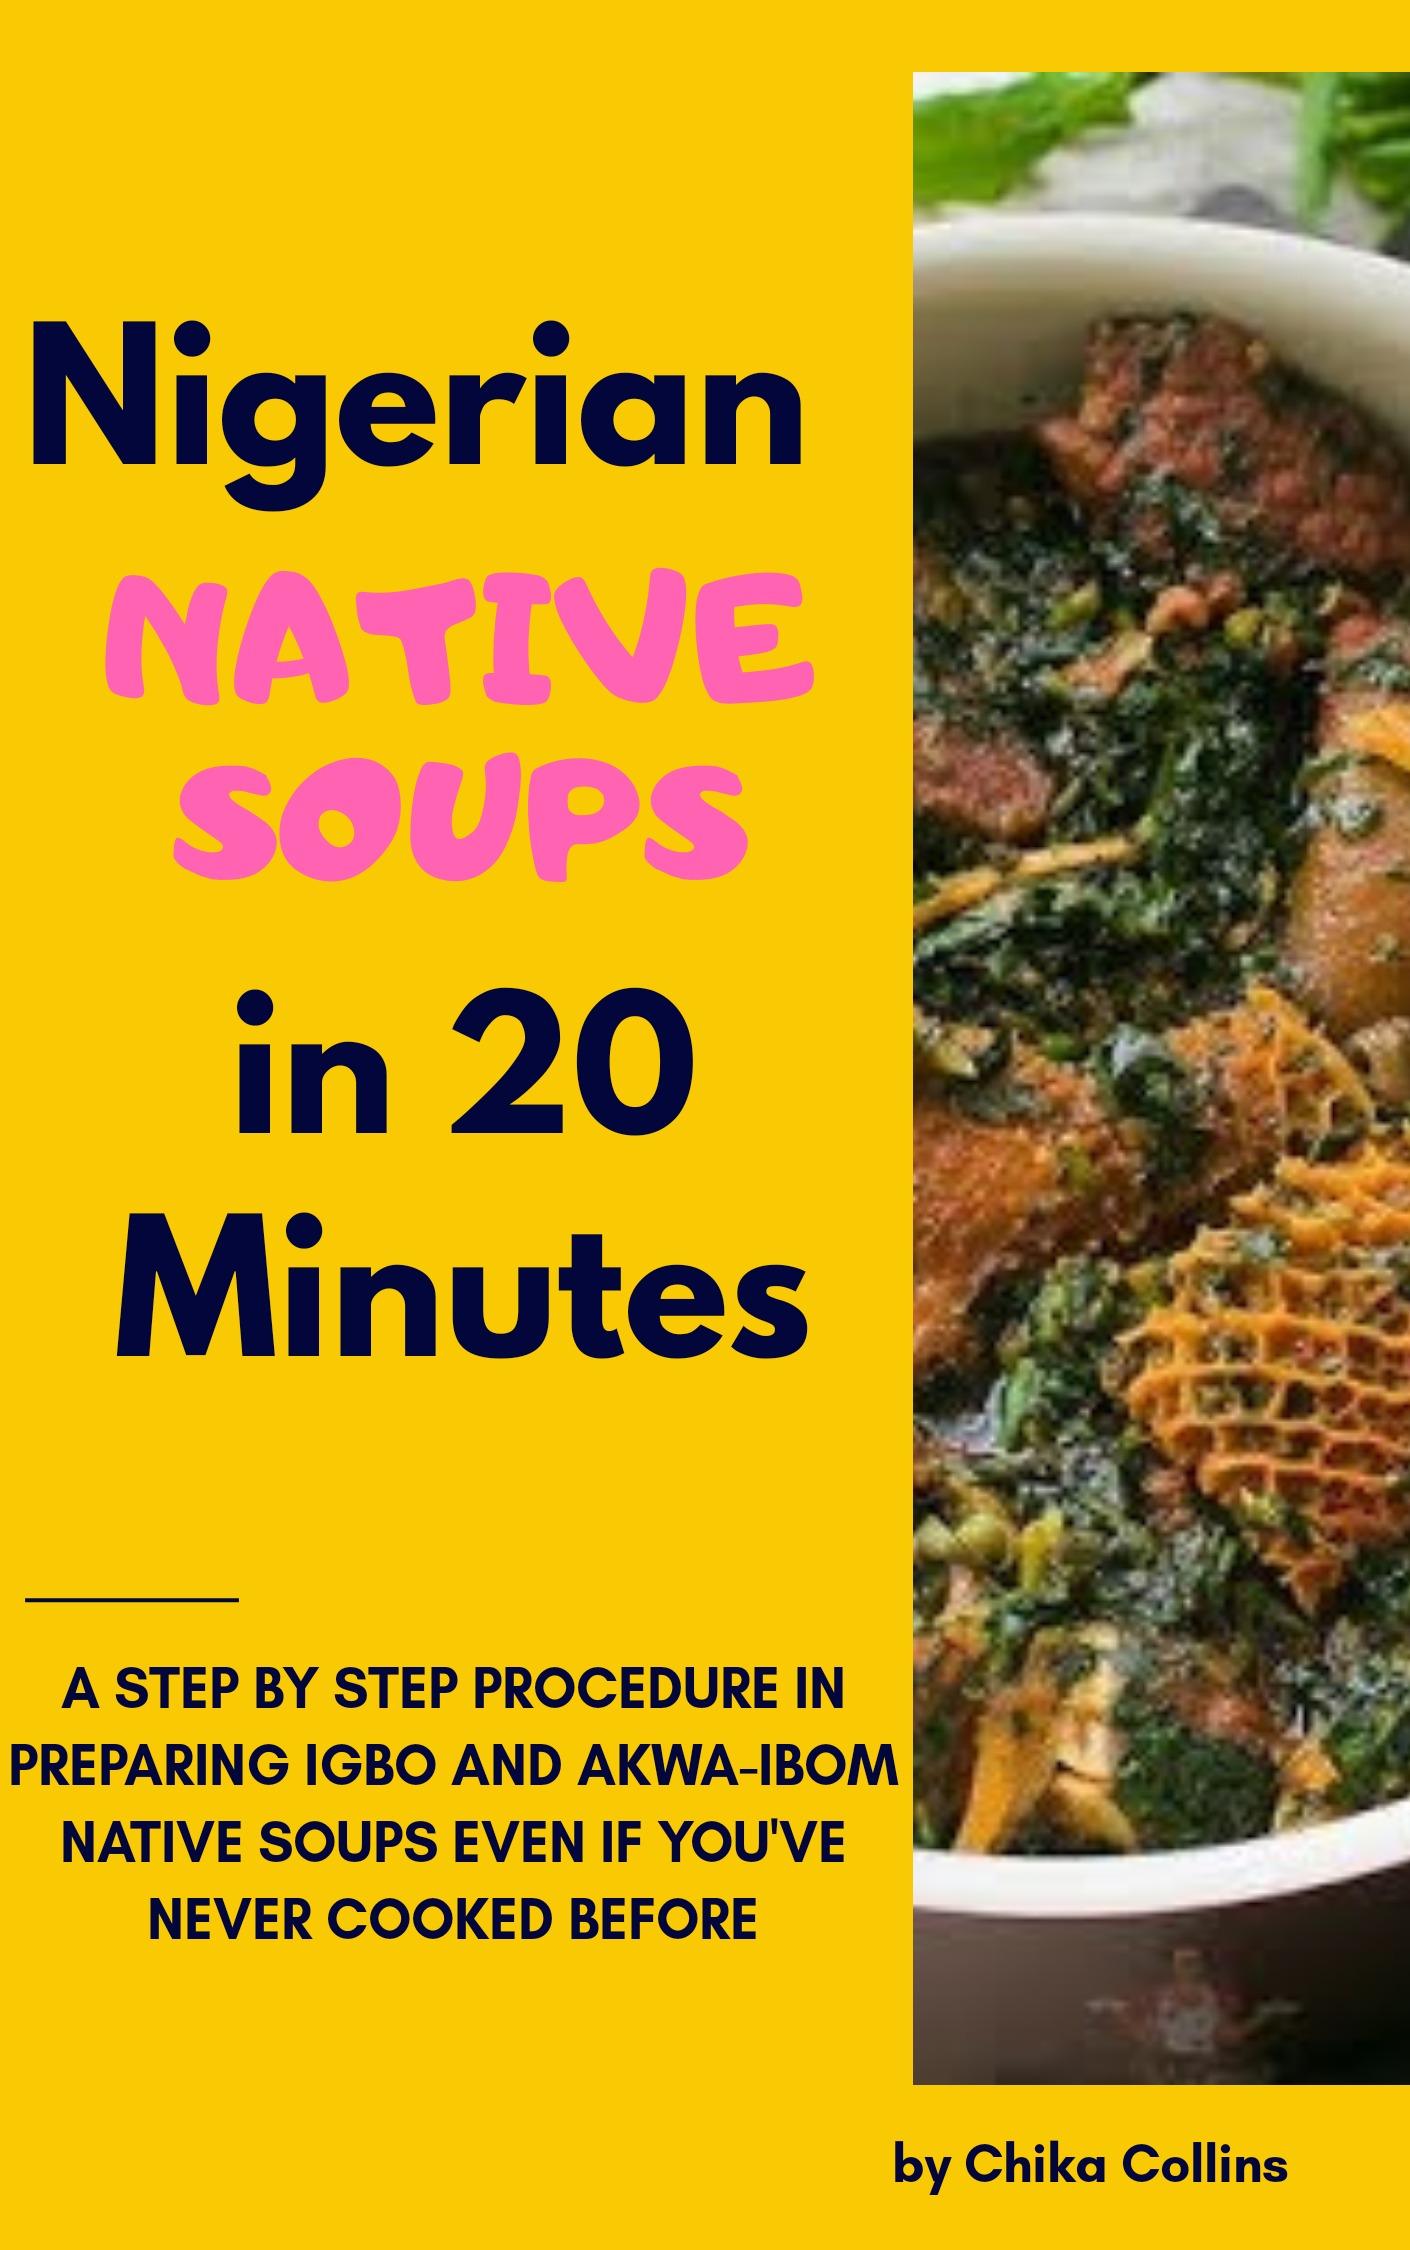 Nigerian Native Soups